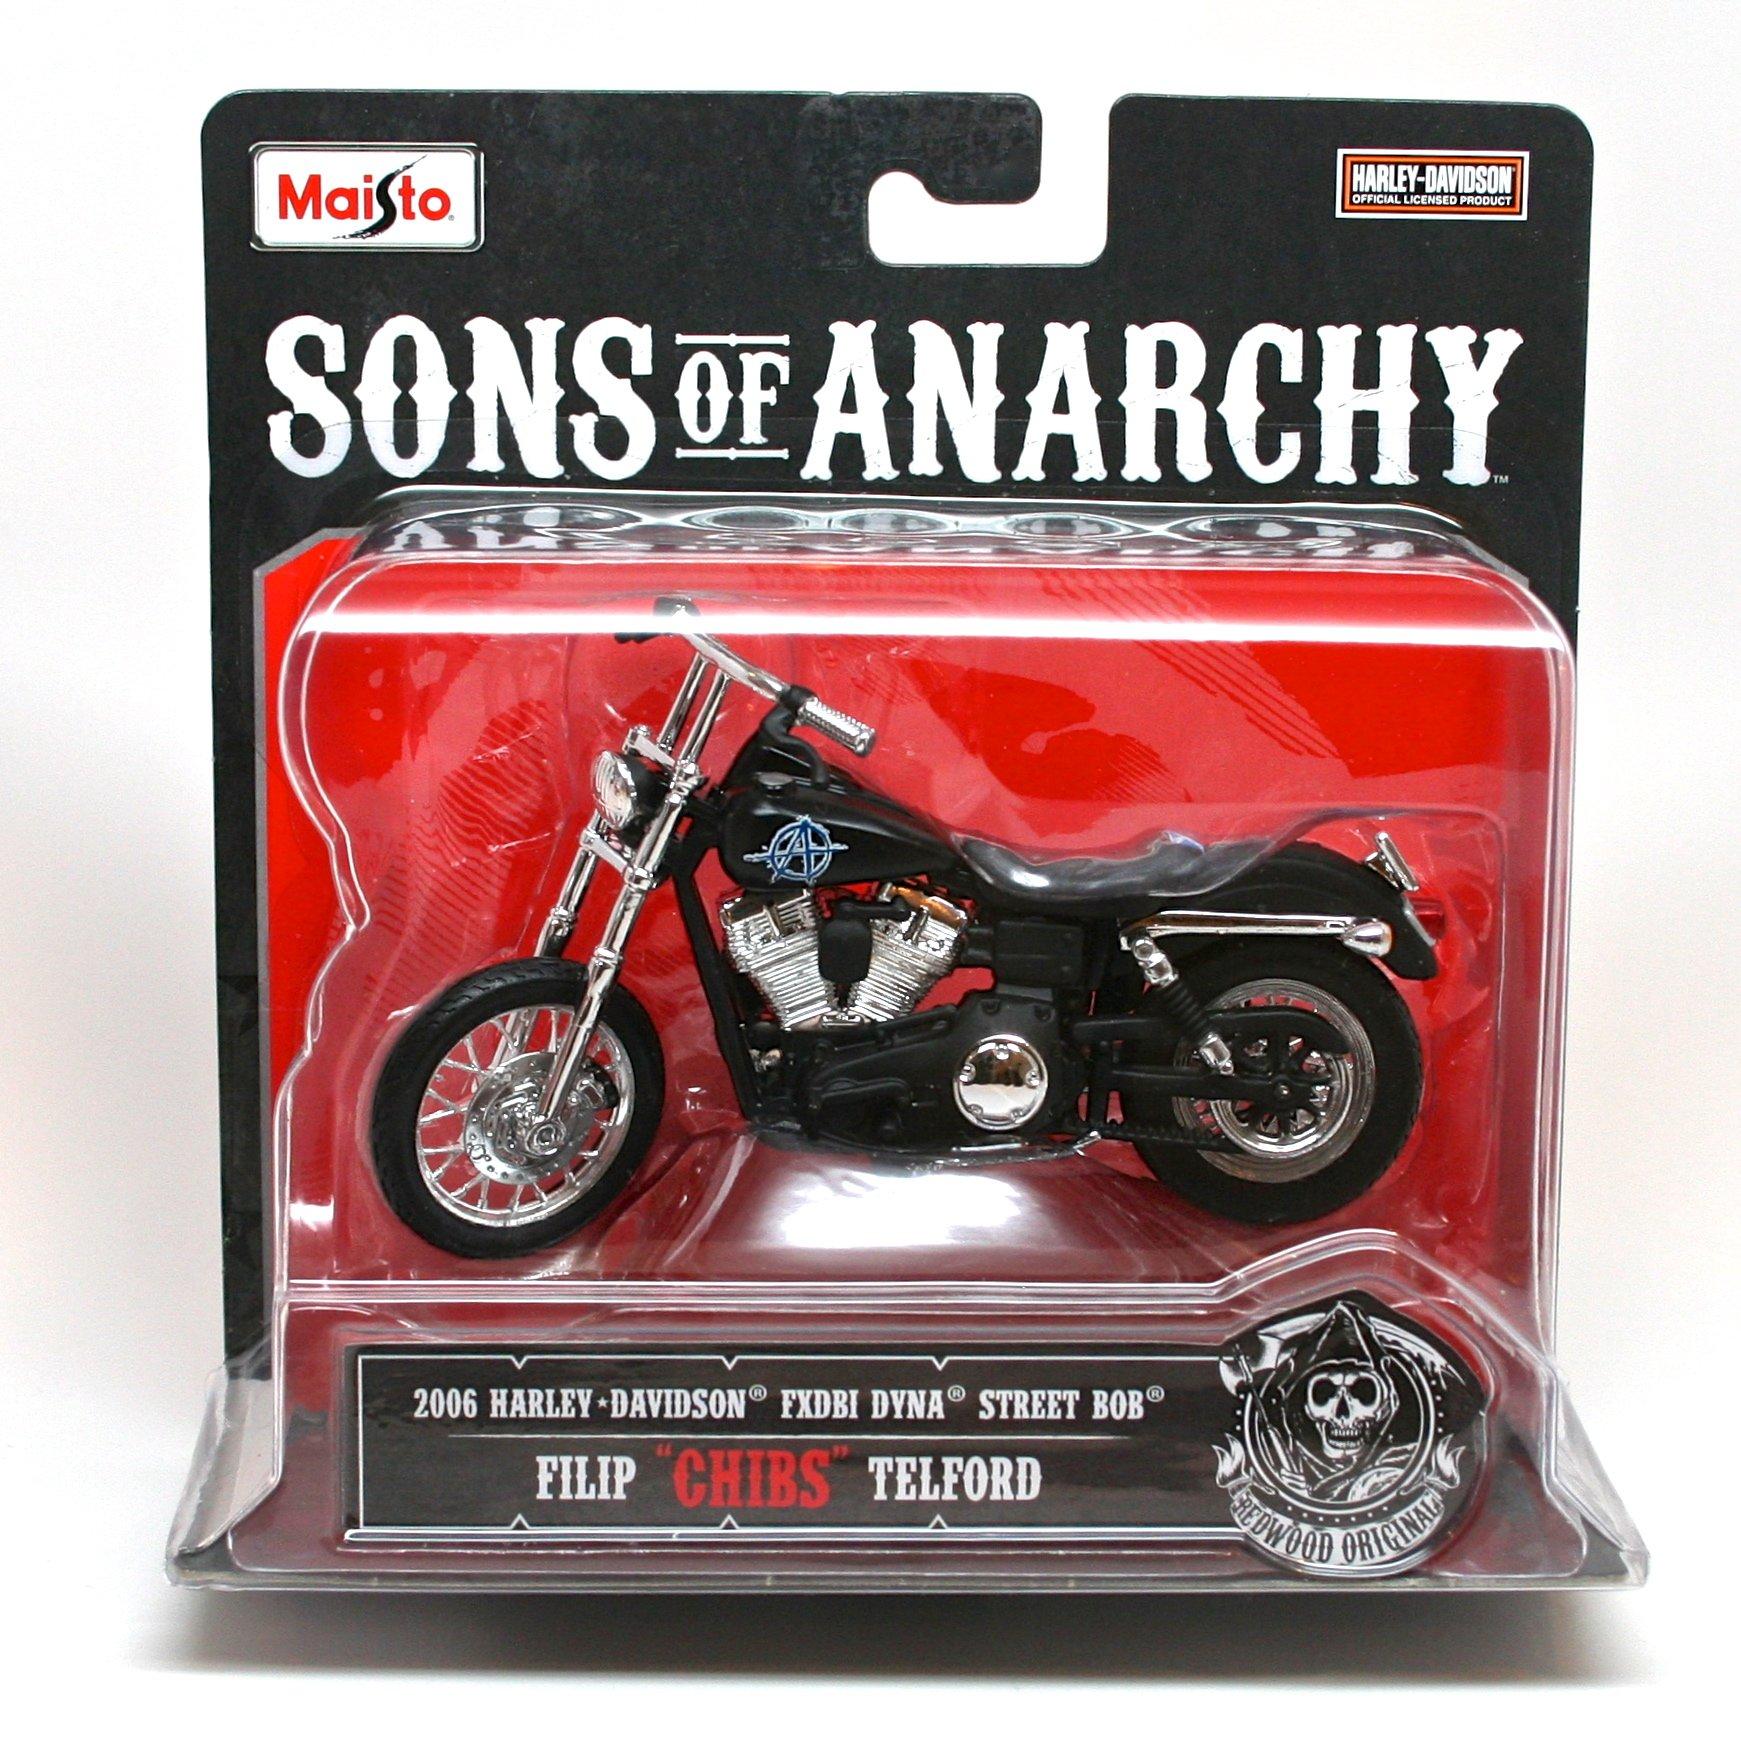 Charlie Hunnam Motorcycle